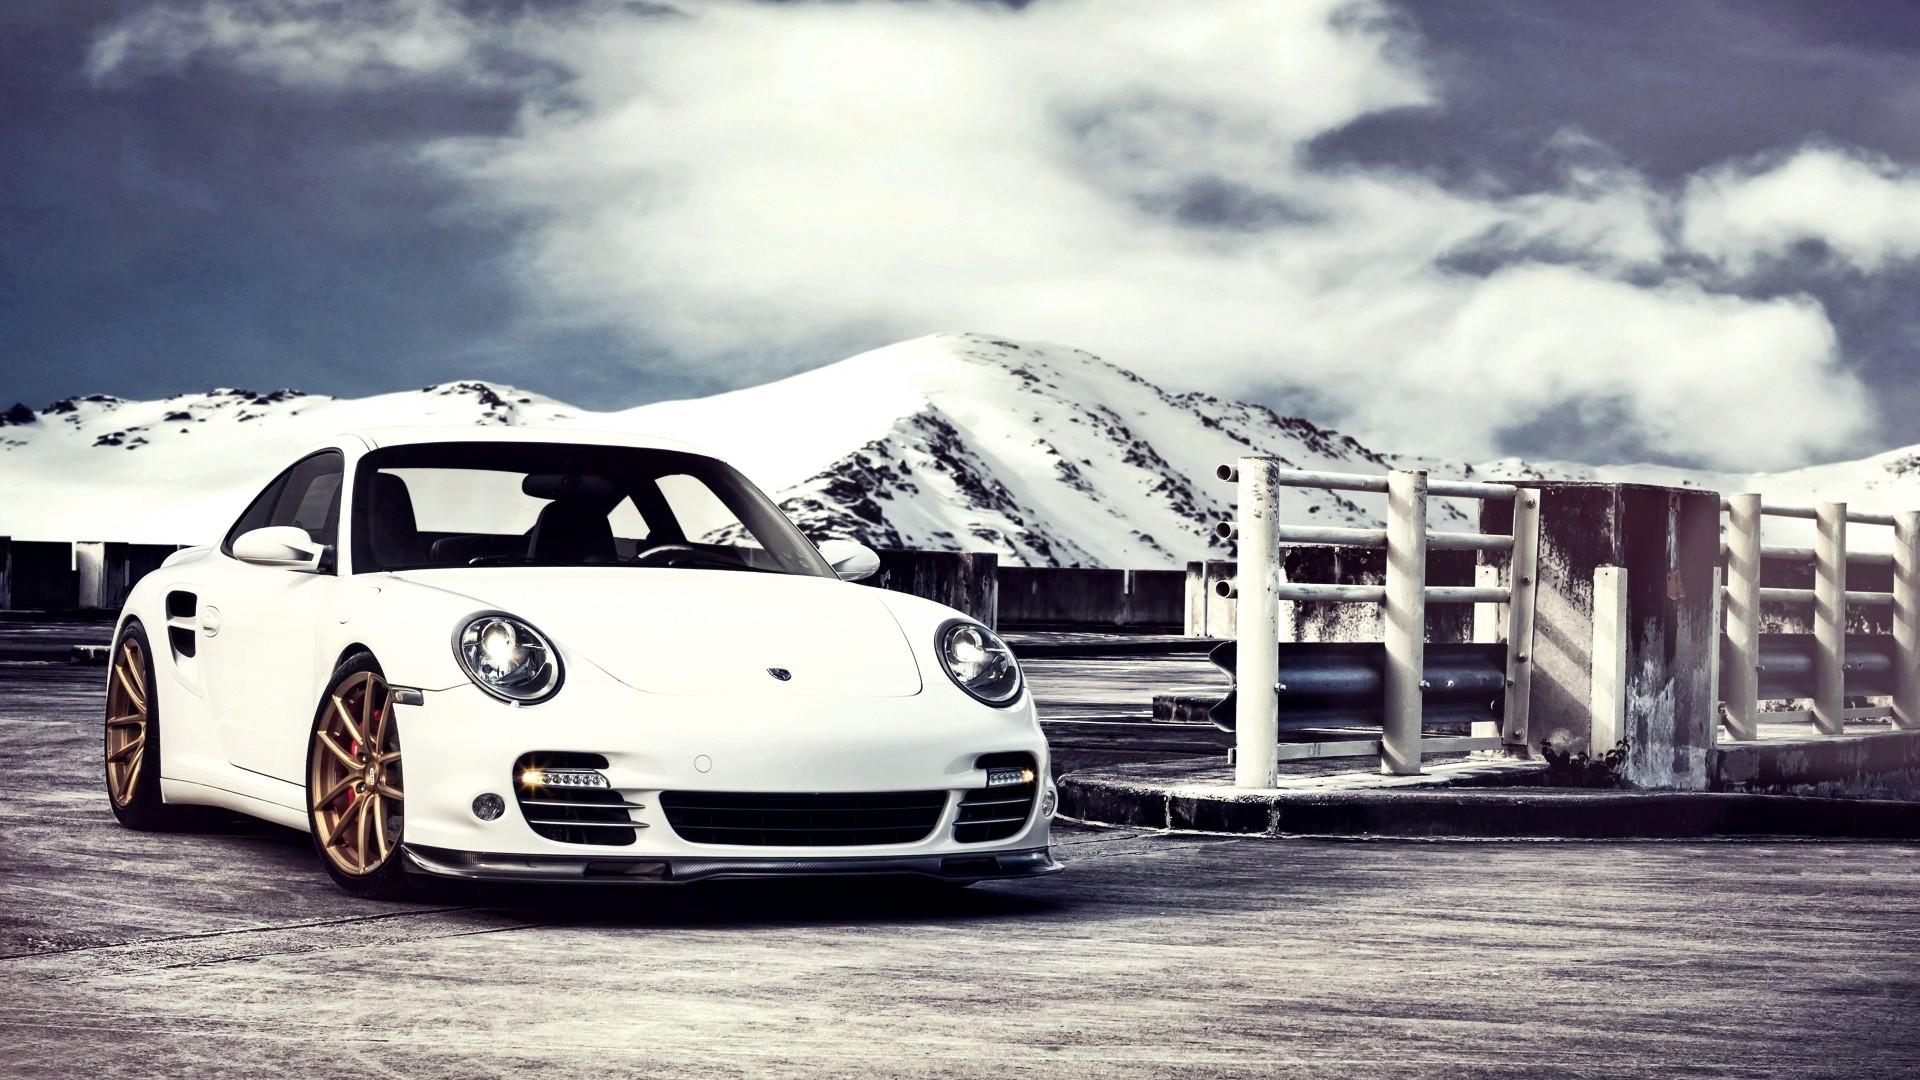 Porsche 911 Turbo Car HD Desktop Wallpaper HD Desktop Wallpaper 1920x1080